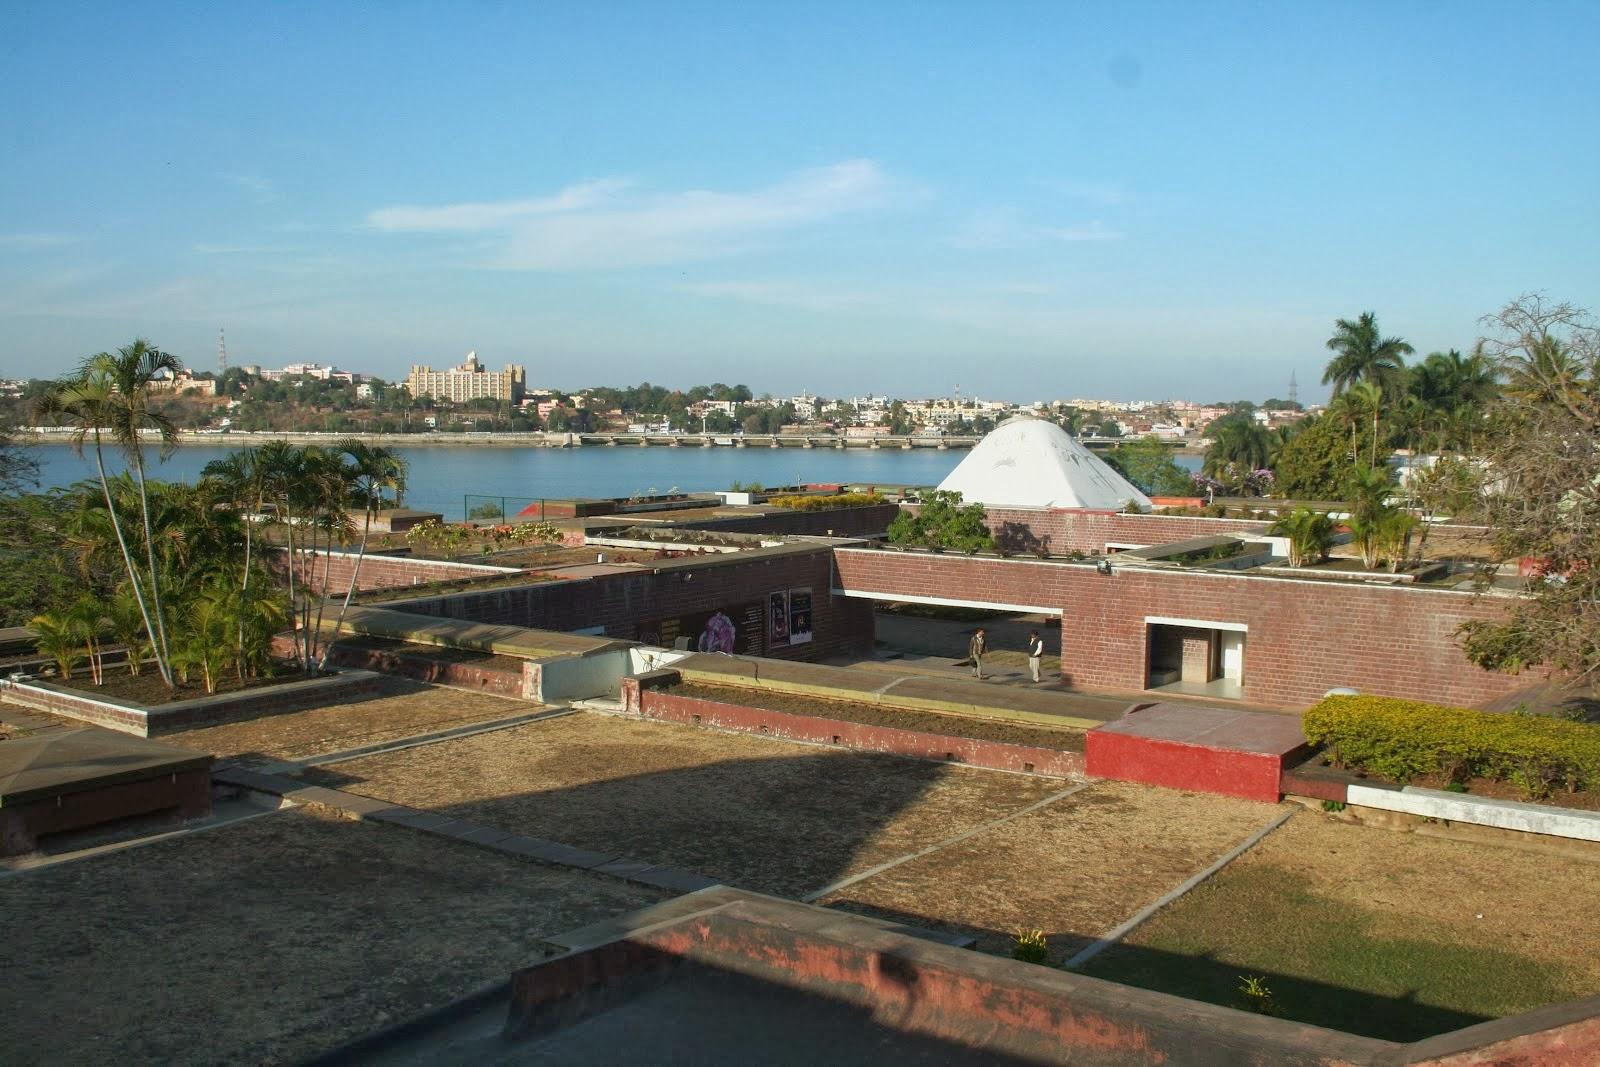 Bharat Bhavan Bhopal India